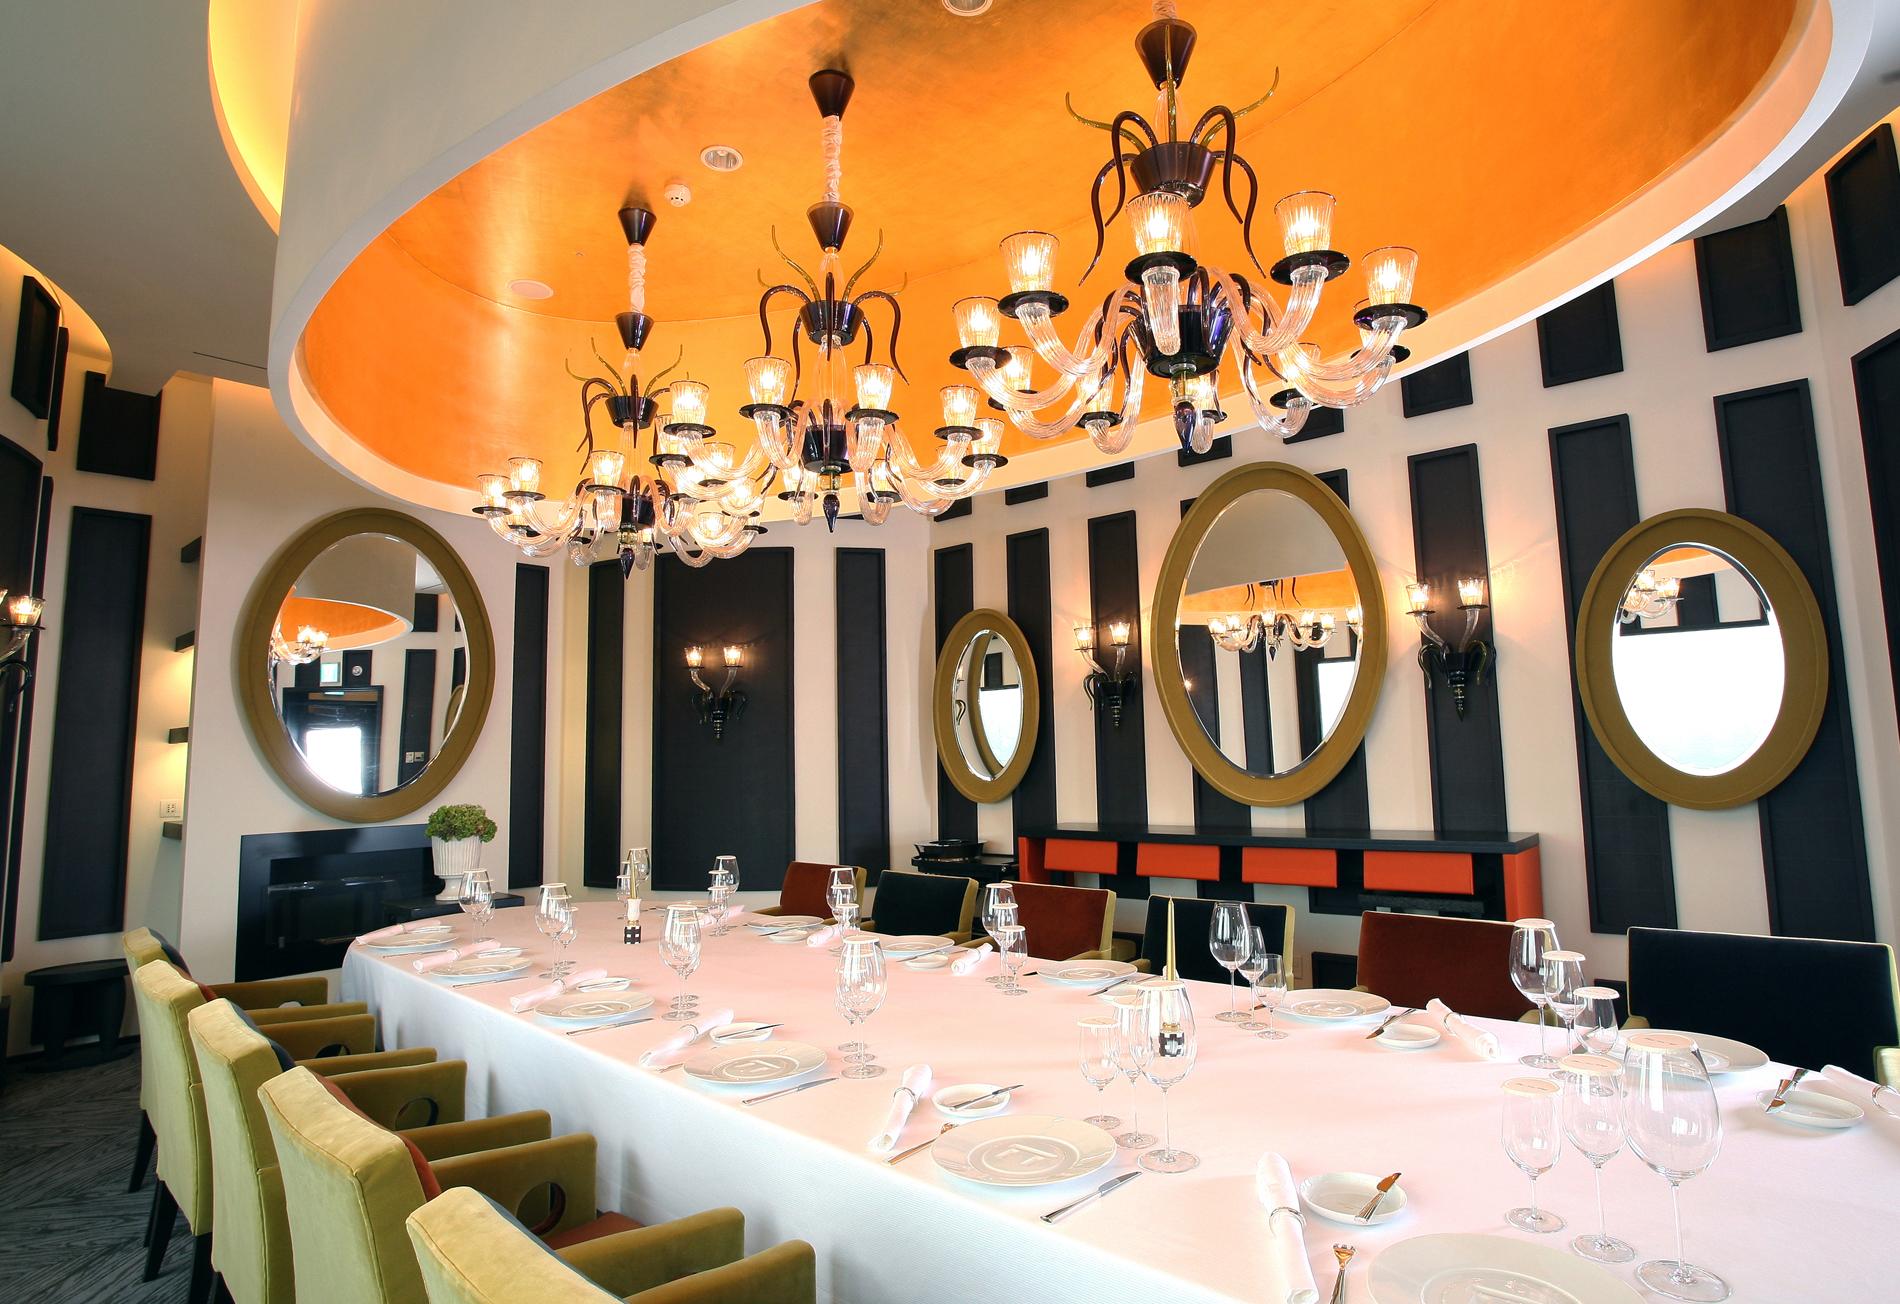 pierre-gagnaire-restaurant-seoul-olivier-gagnere-veronese-2